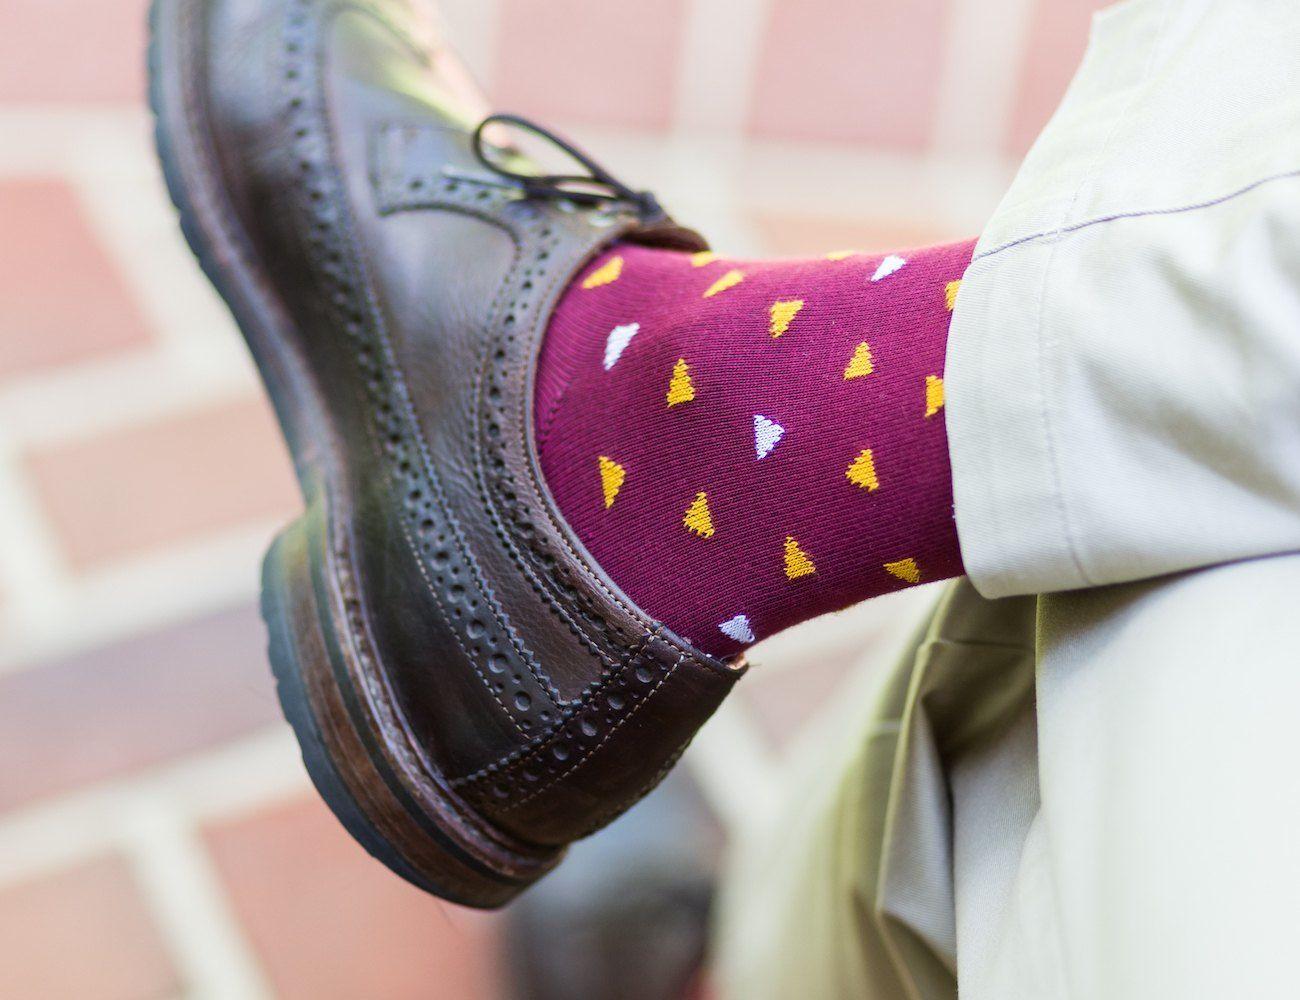 high quality socks review